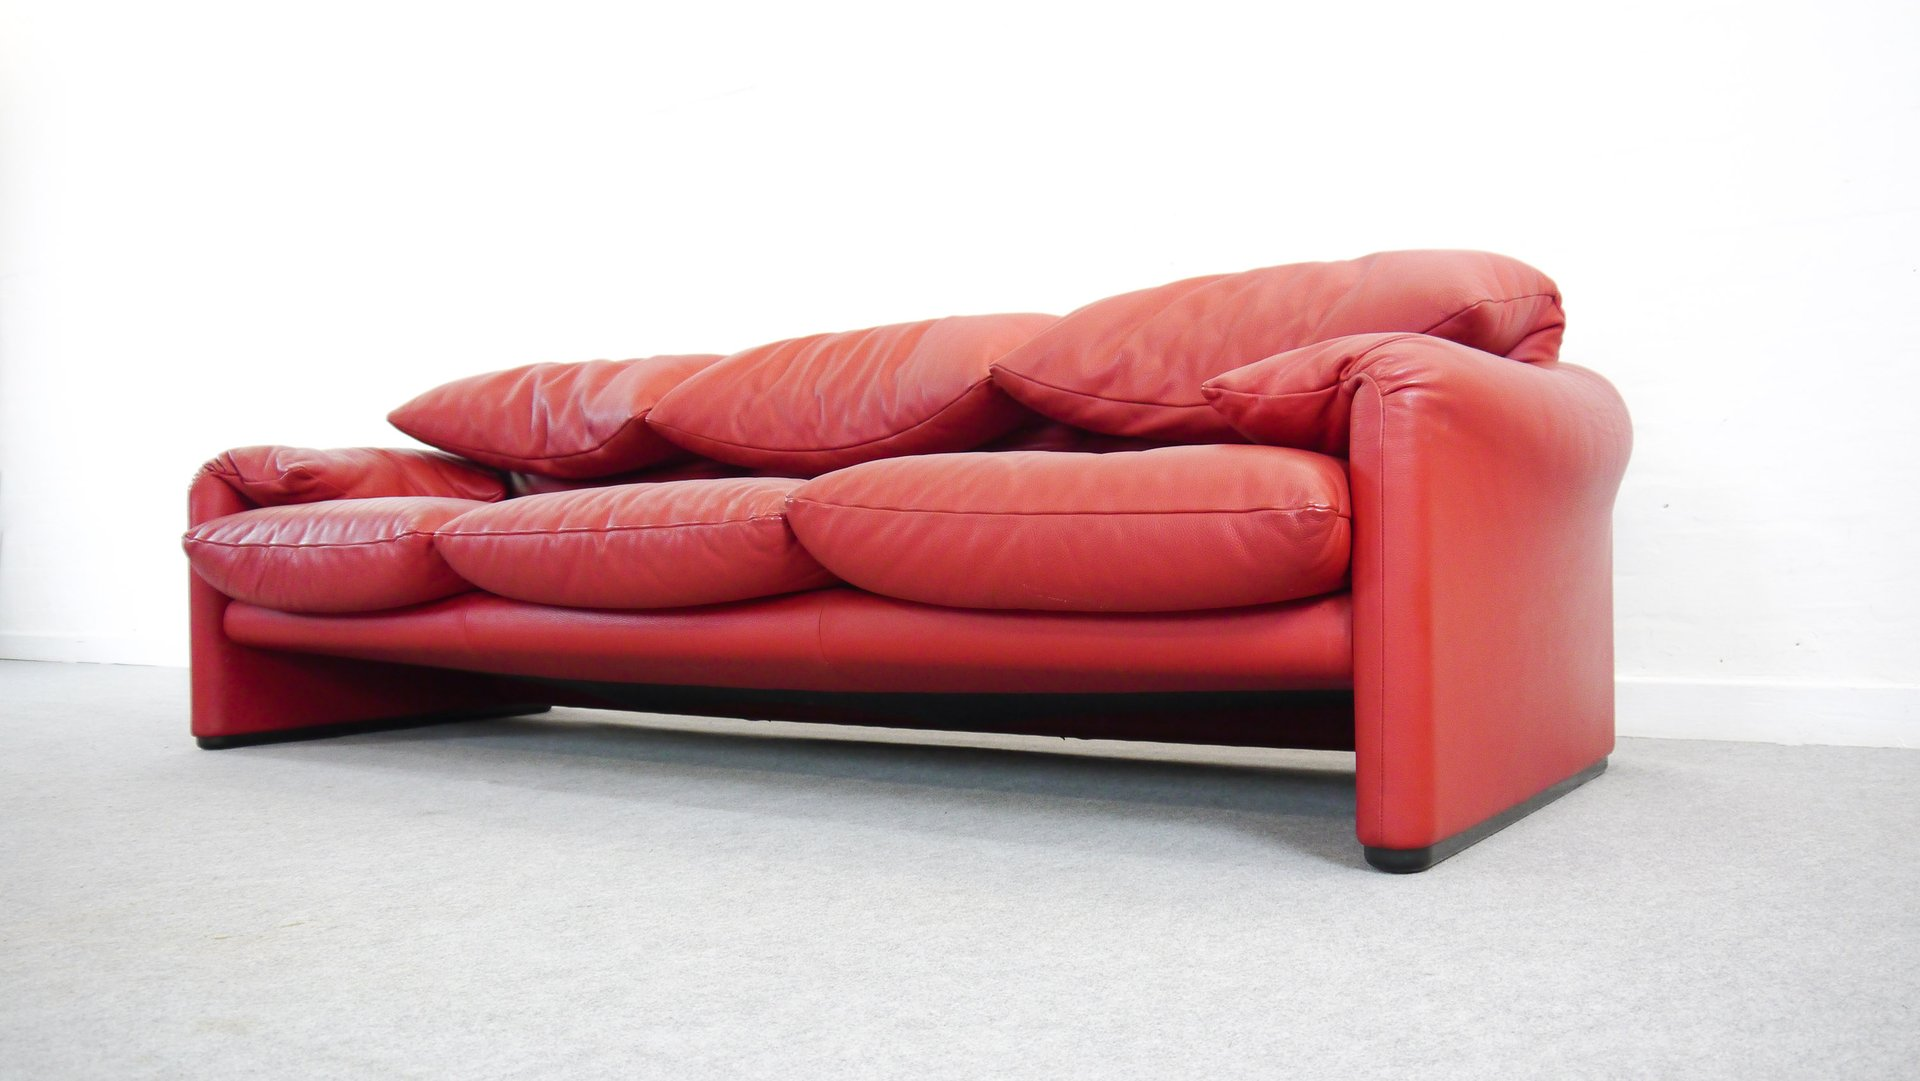 Vintage Maralunga Sofa By Vico Magistretti For Cassina For